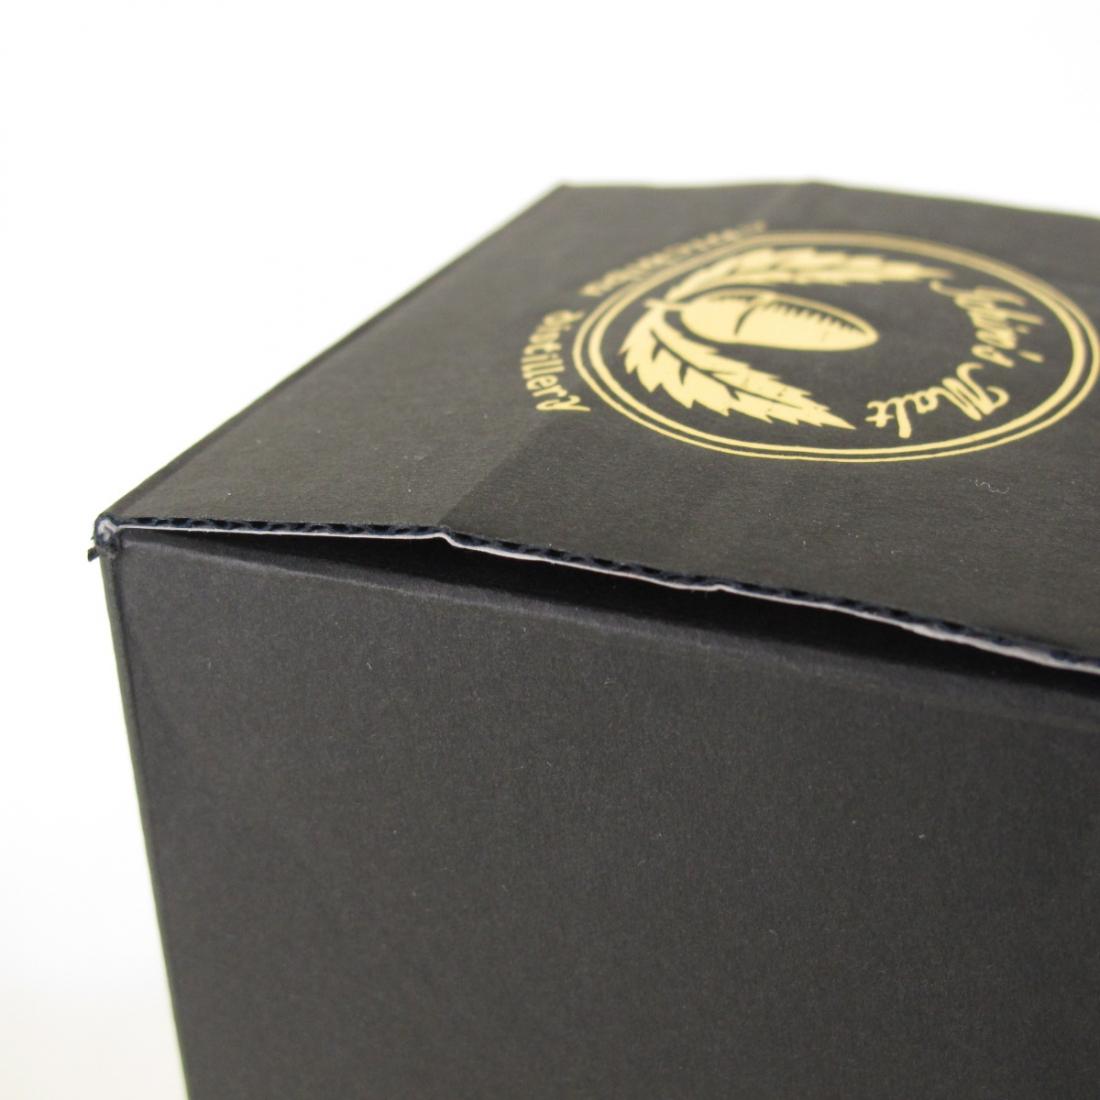 Chichibu 2013 Ichiro's Malt American White Oak Cask #2688